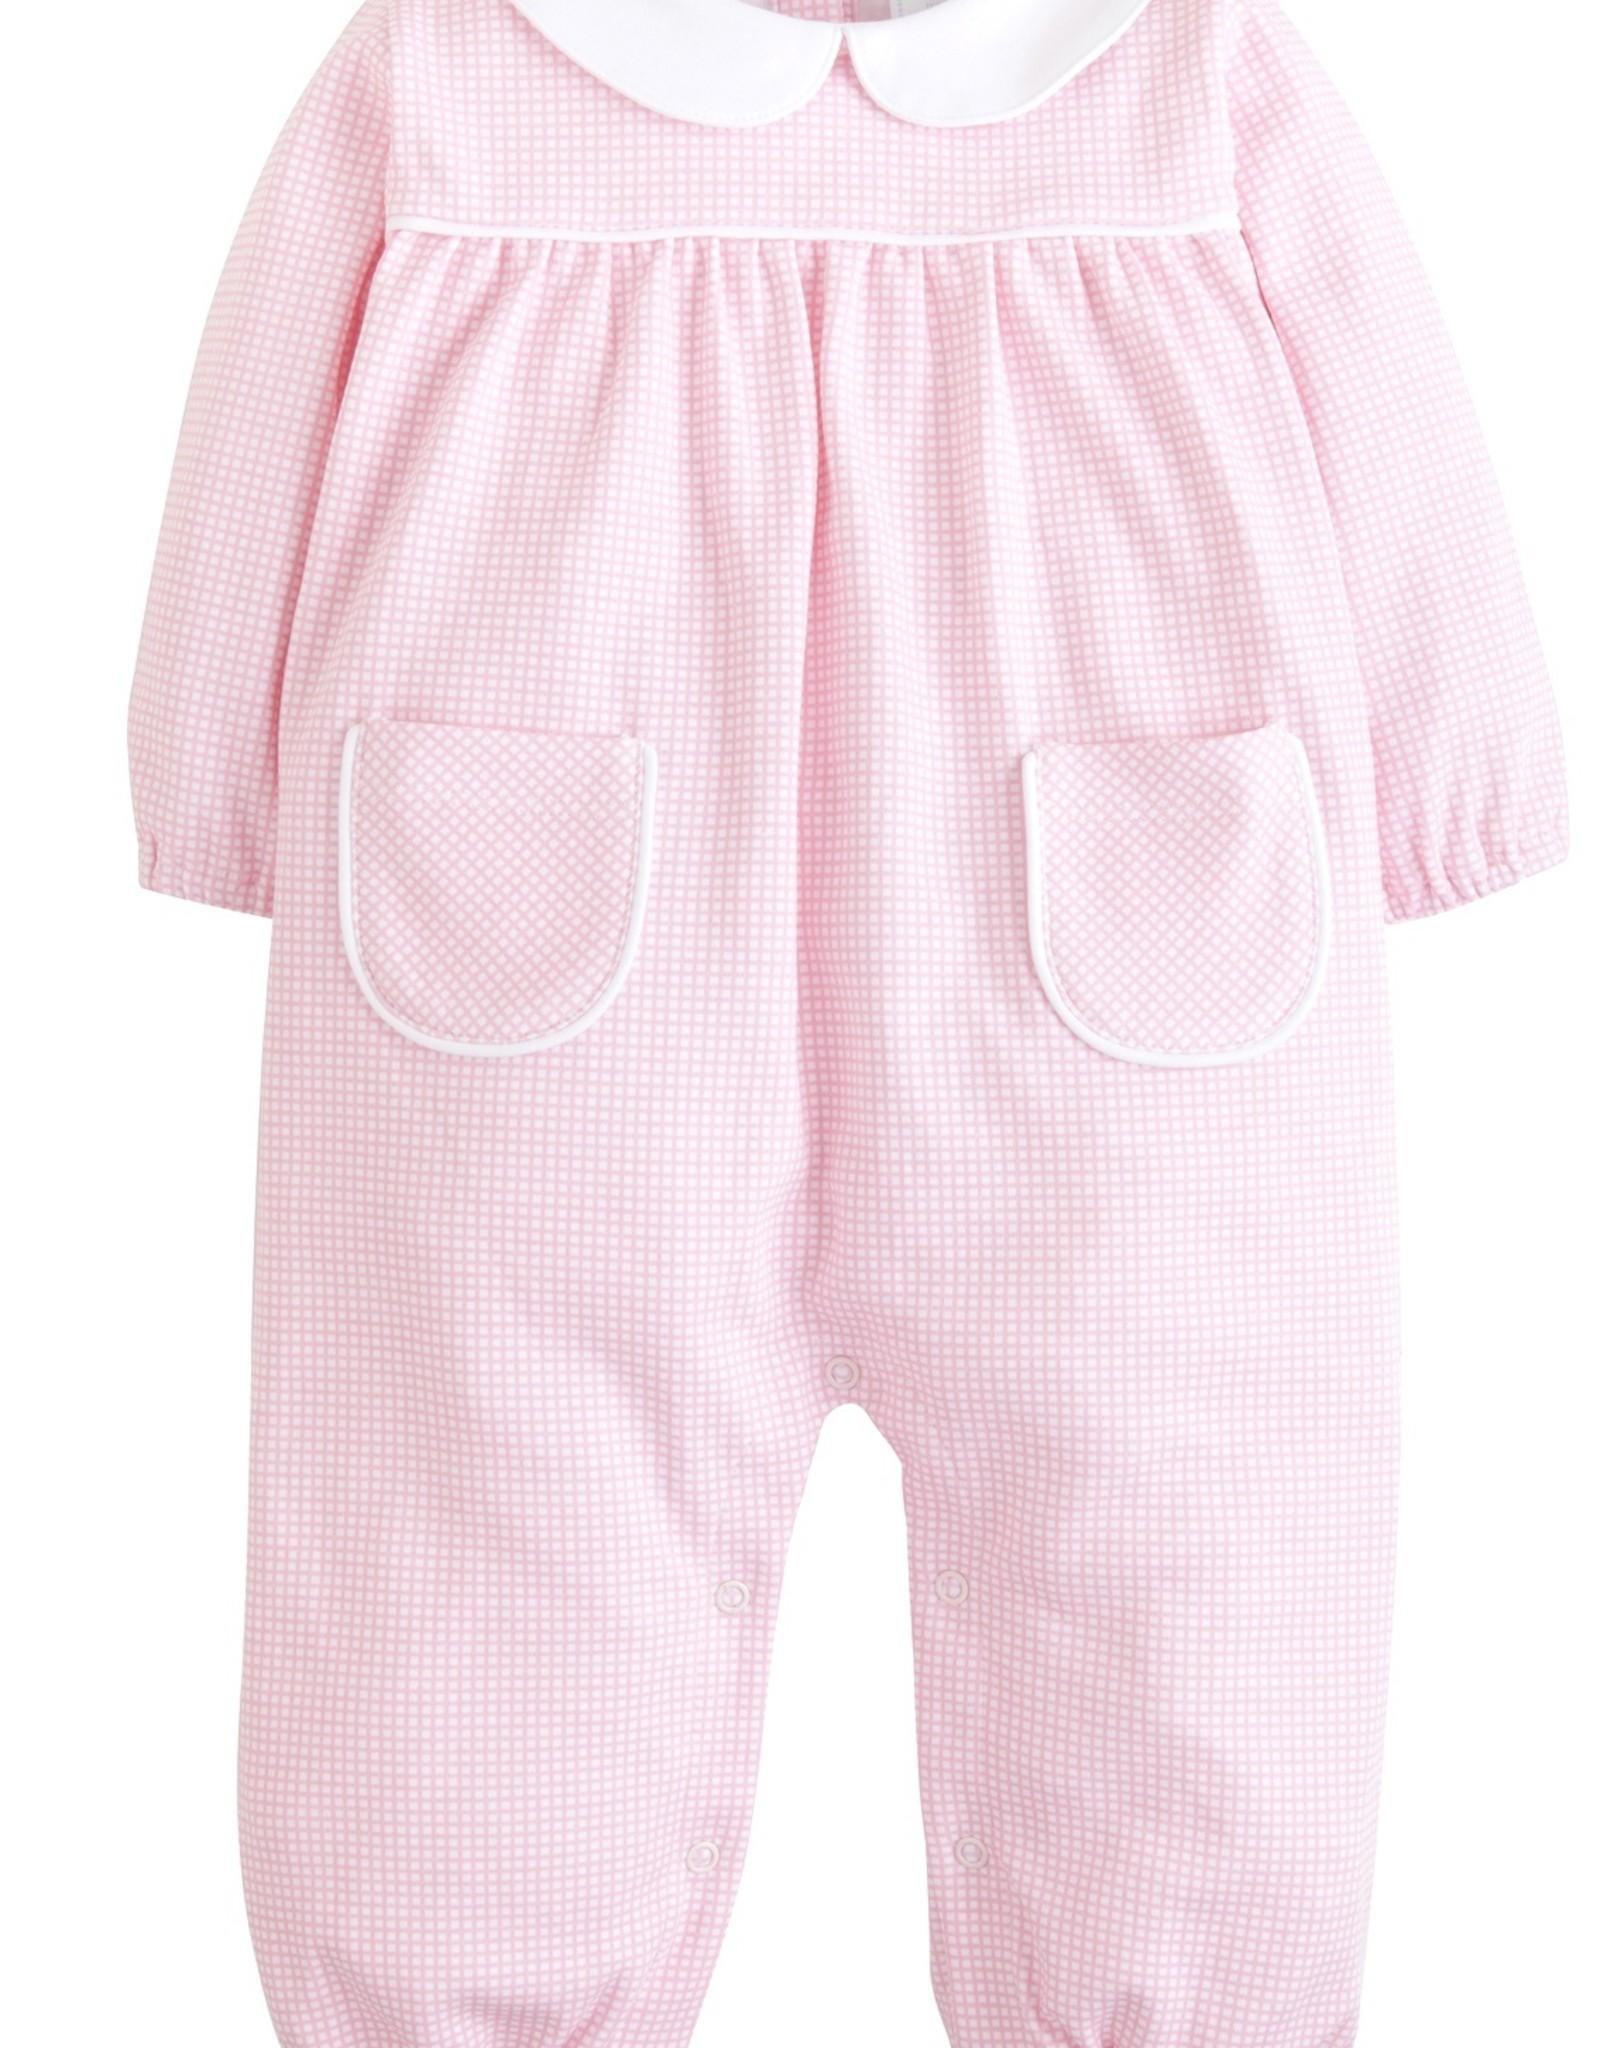 Little English Pink Gingham Windowpane Romper